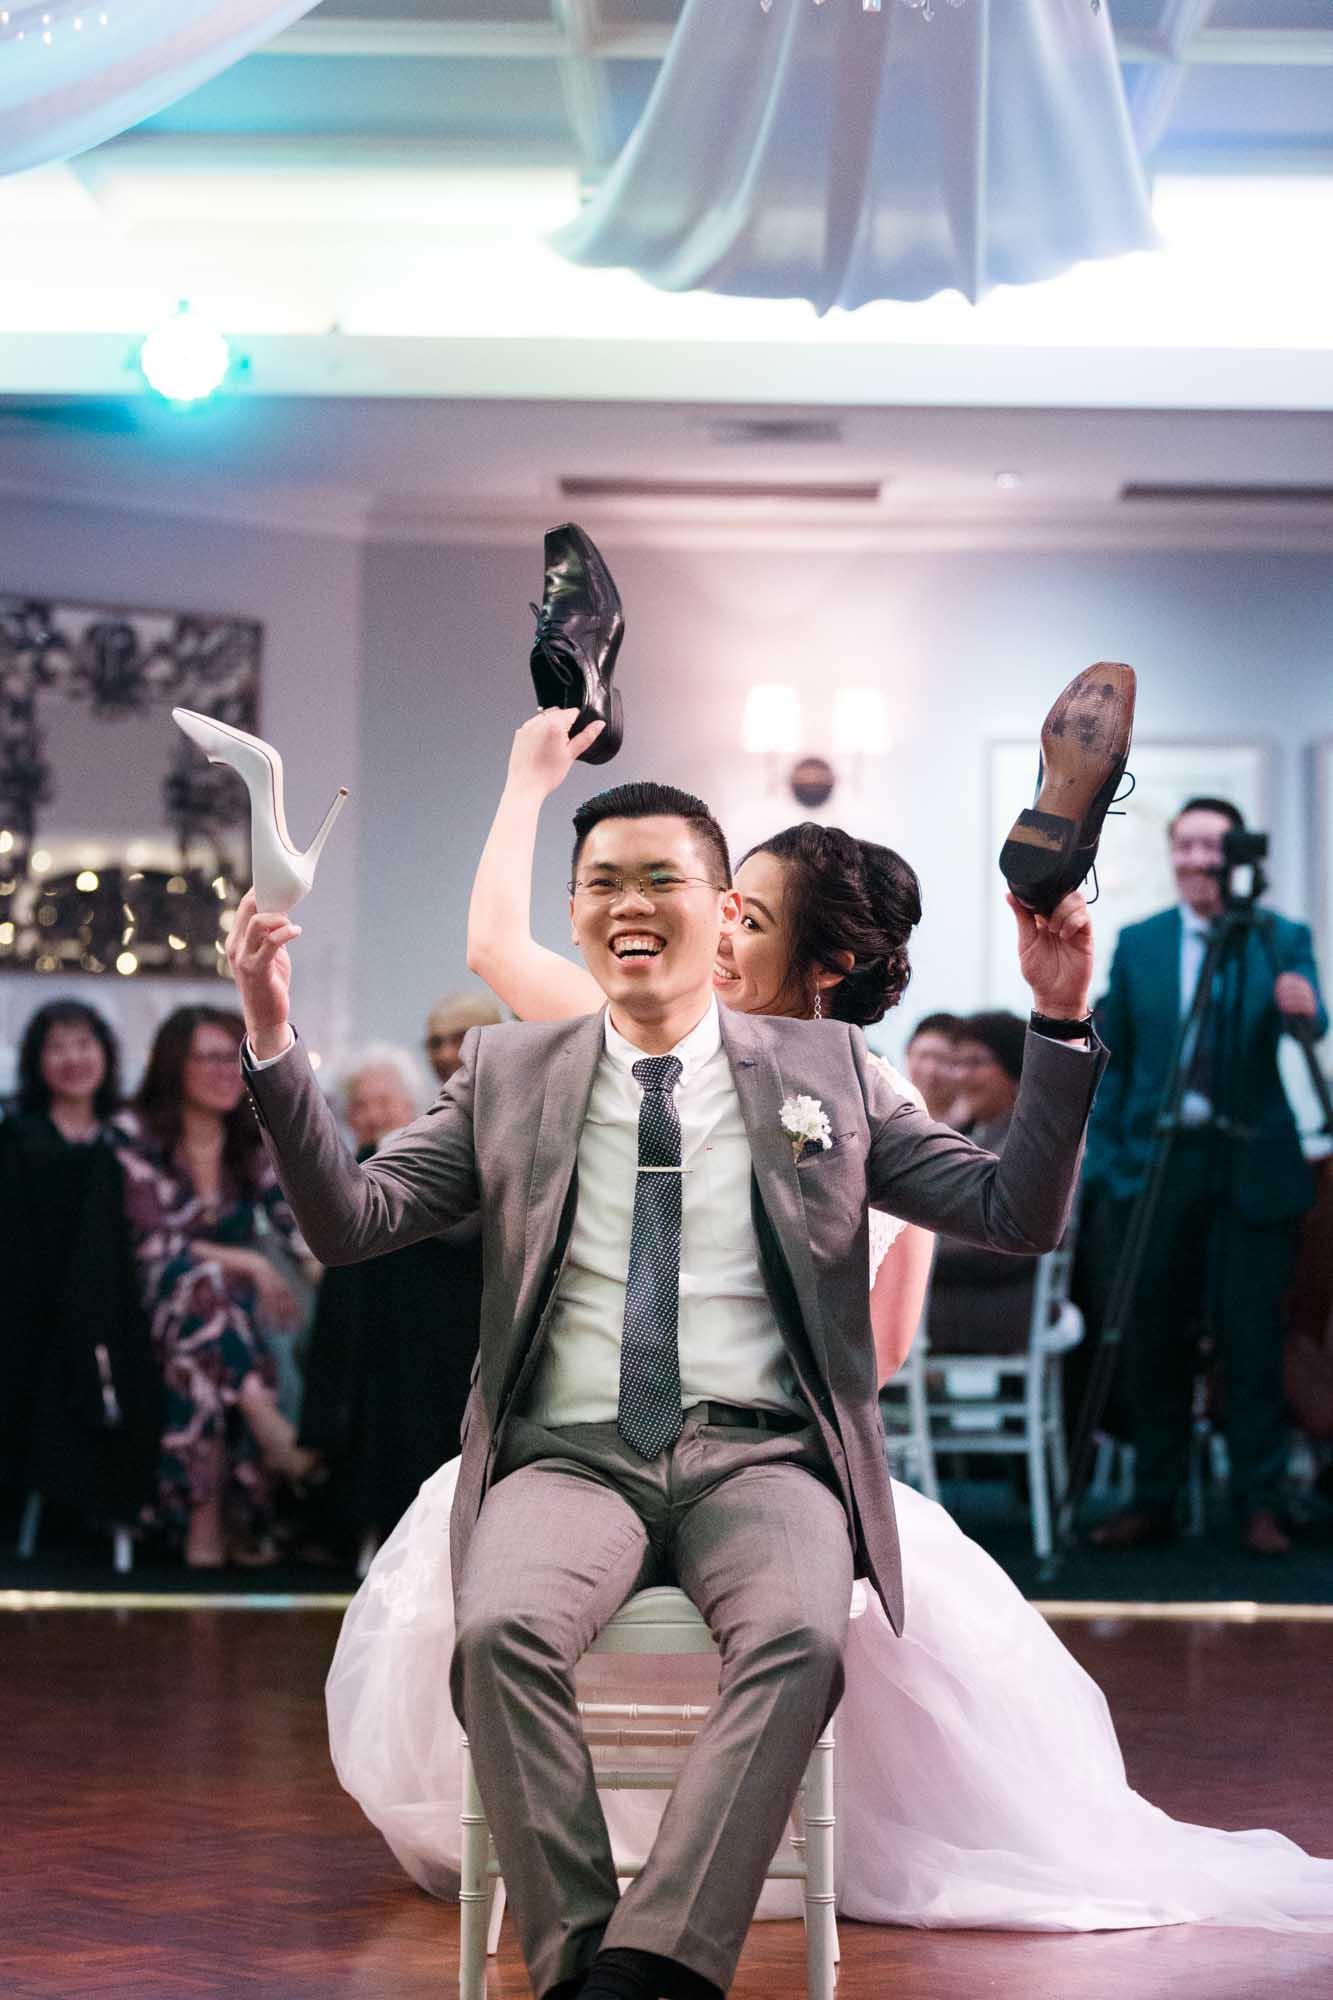 ©Sherman Tan Studio_Melbourne Wedding Photographer_Paul & Rowenia_05_Reception_521.jpg